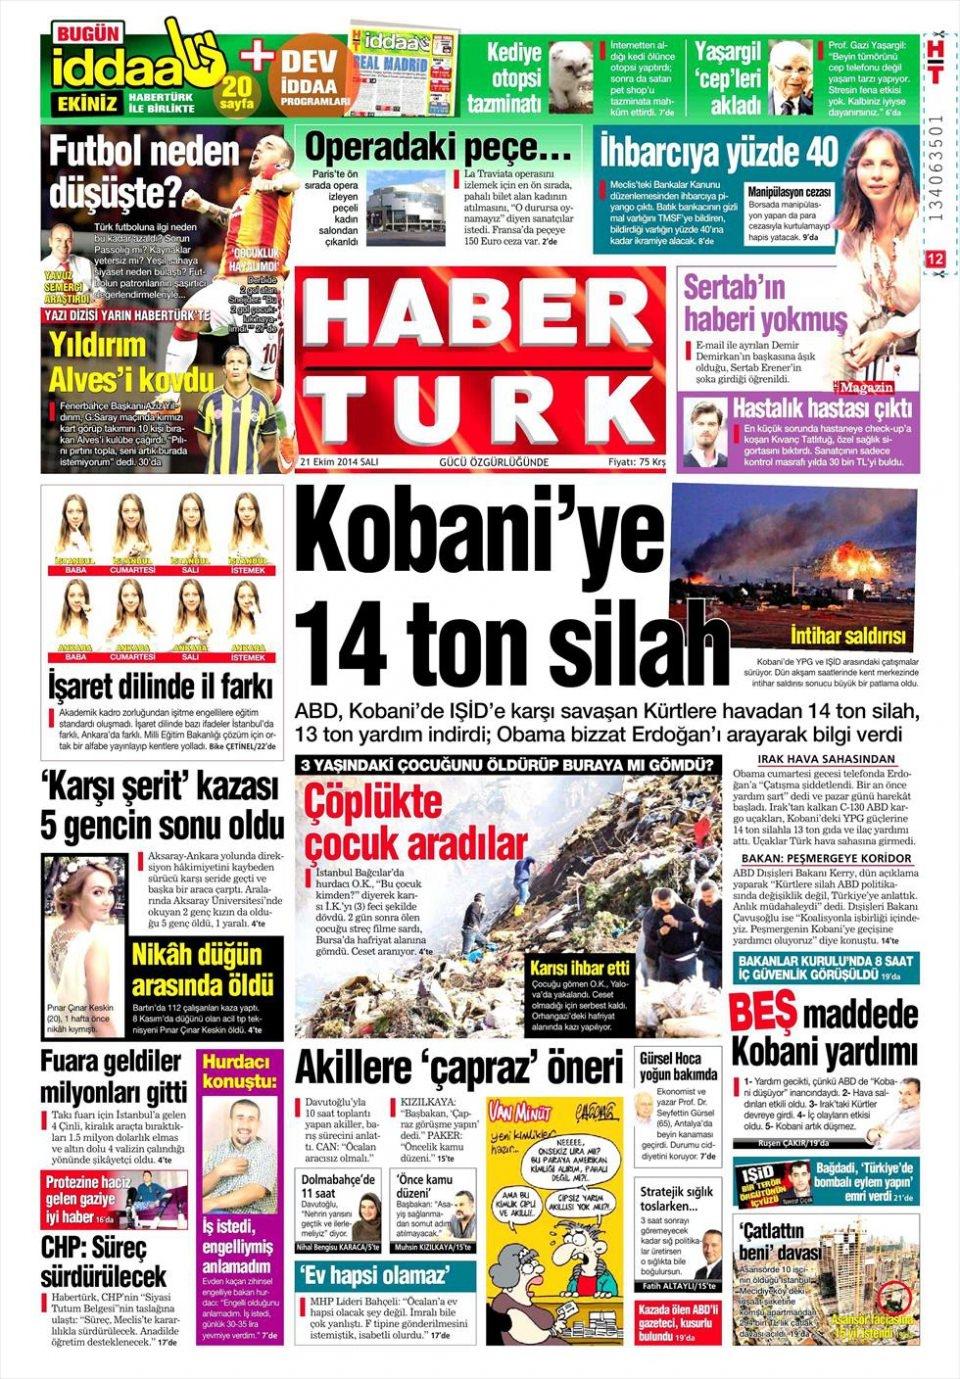 21 Ekim 2014 gazete manşetleri 8